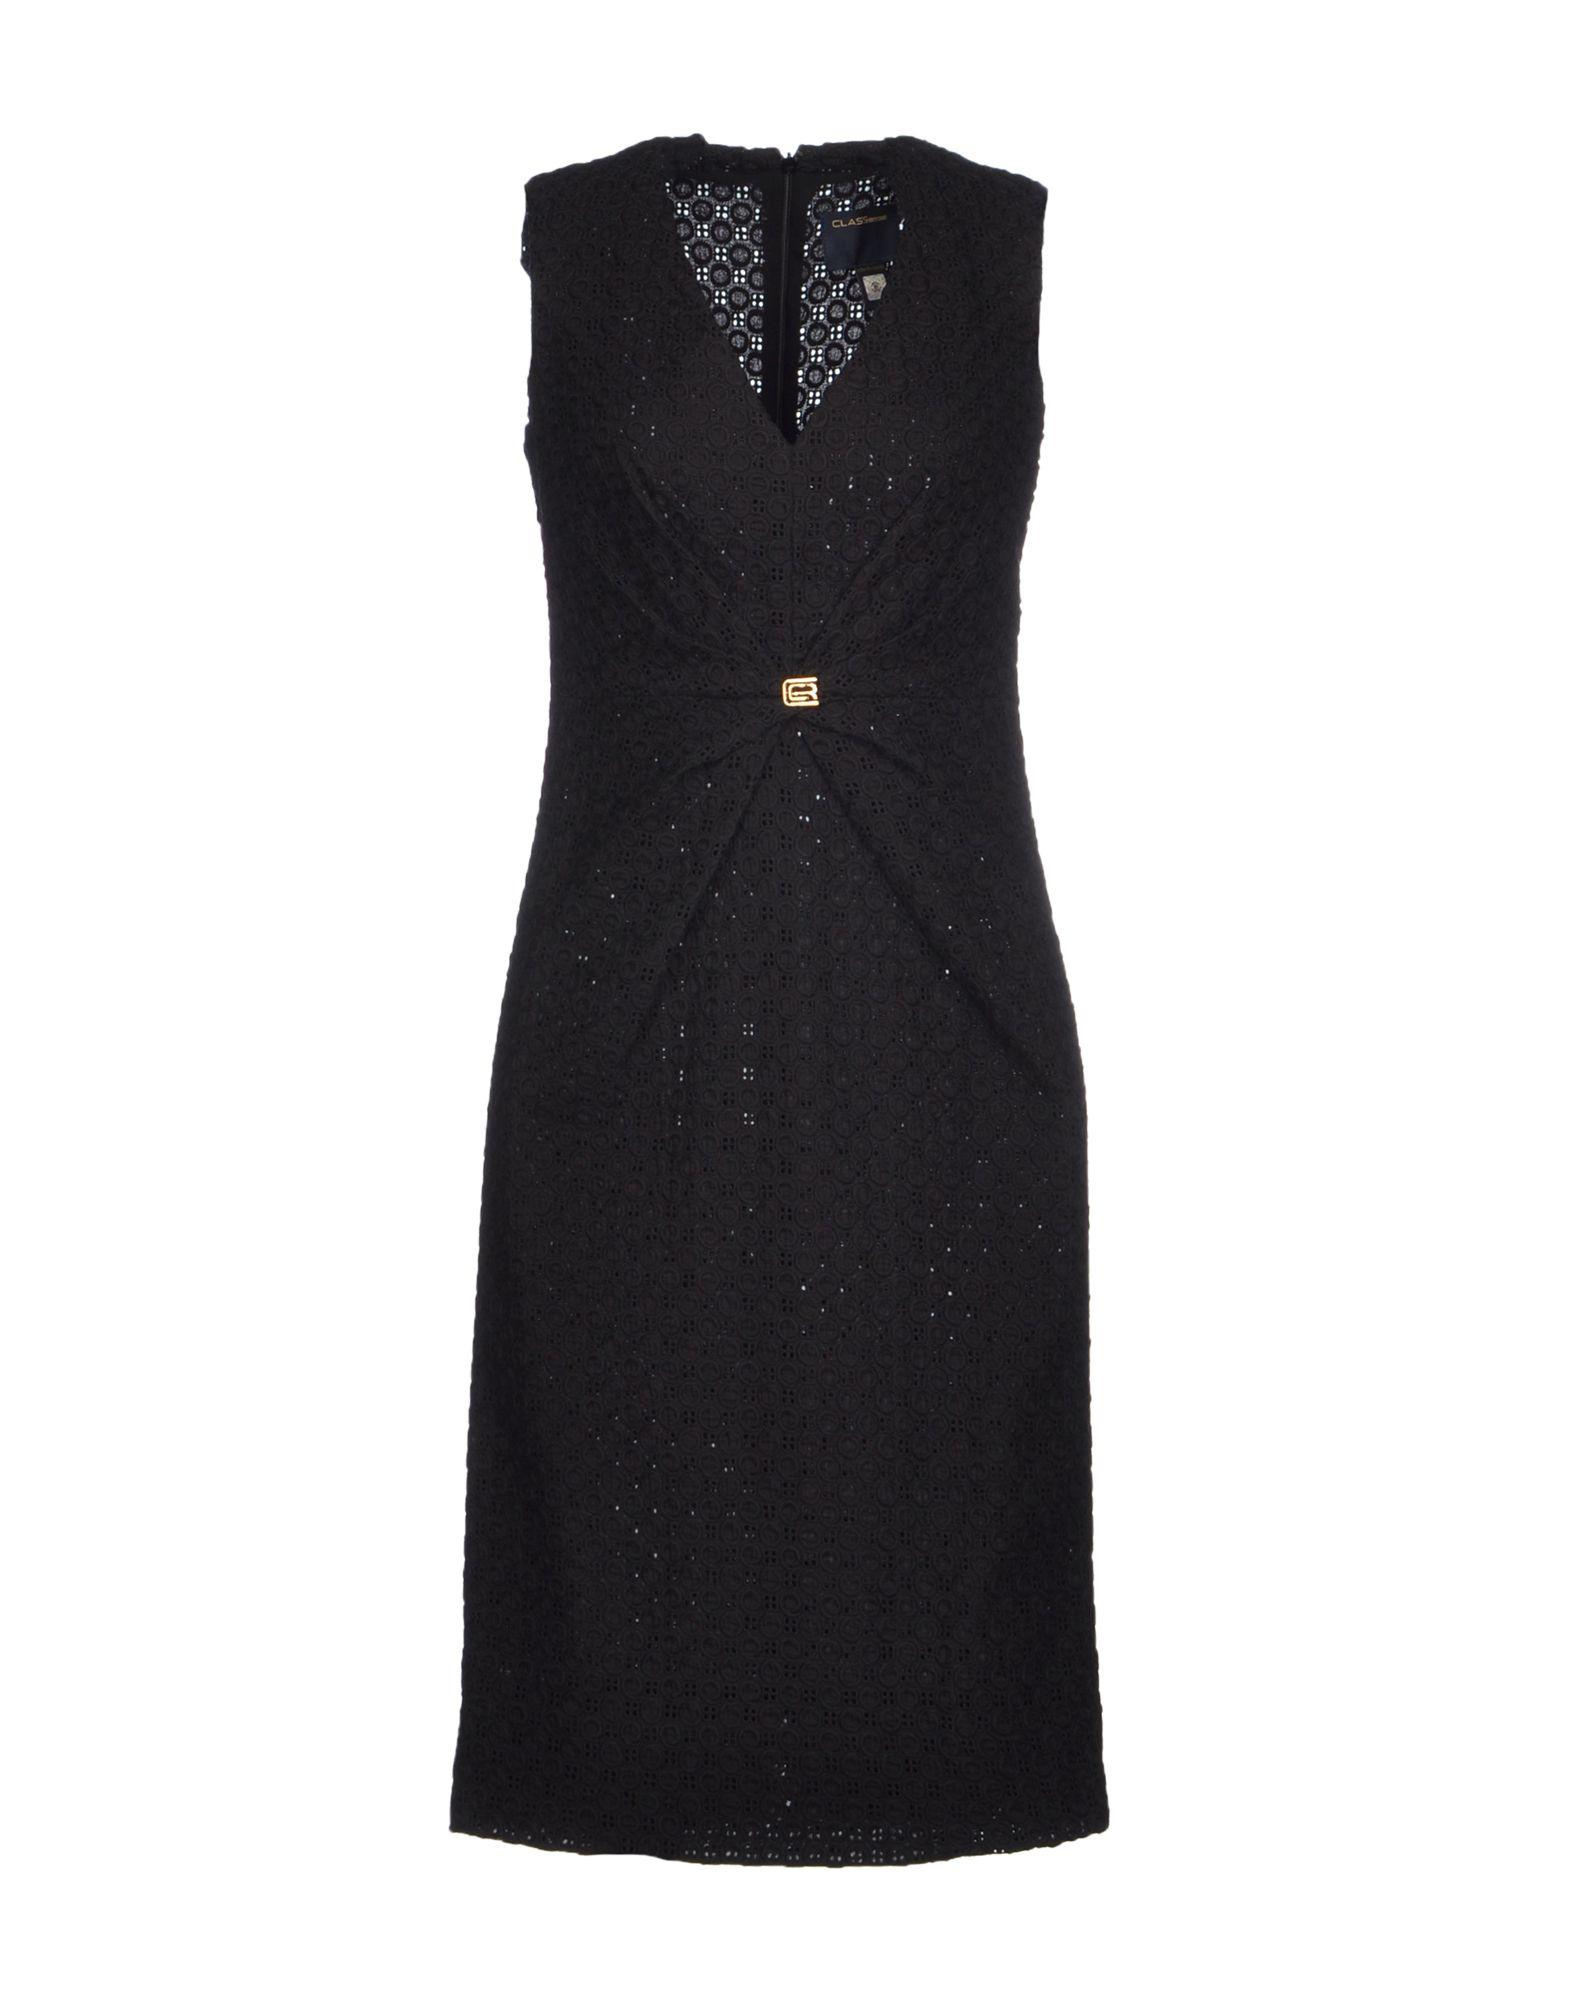 Class roberto cavalli black knee length dress cocktail dresses product